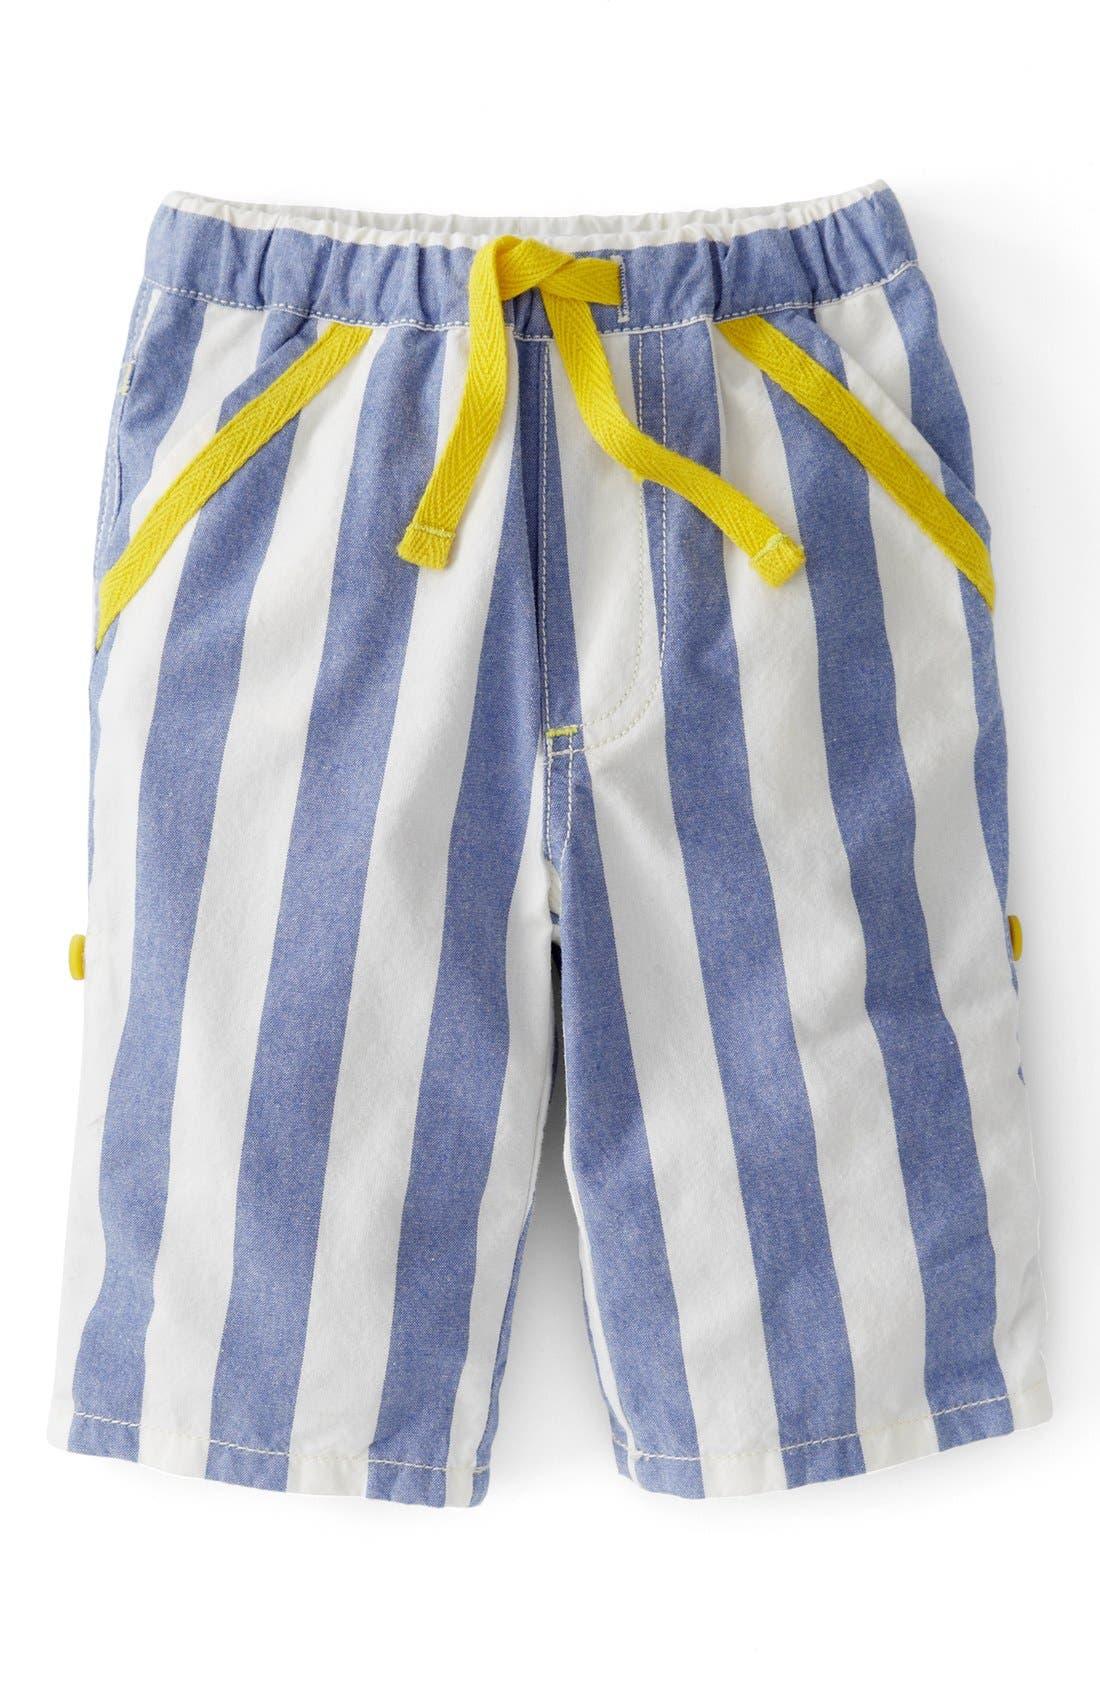 Alternate Image 1 Selected - Mini Boden Check Print Pants (Baby Boys)